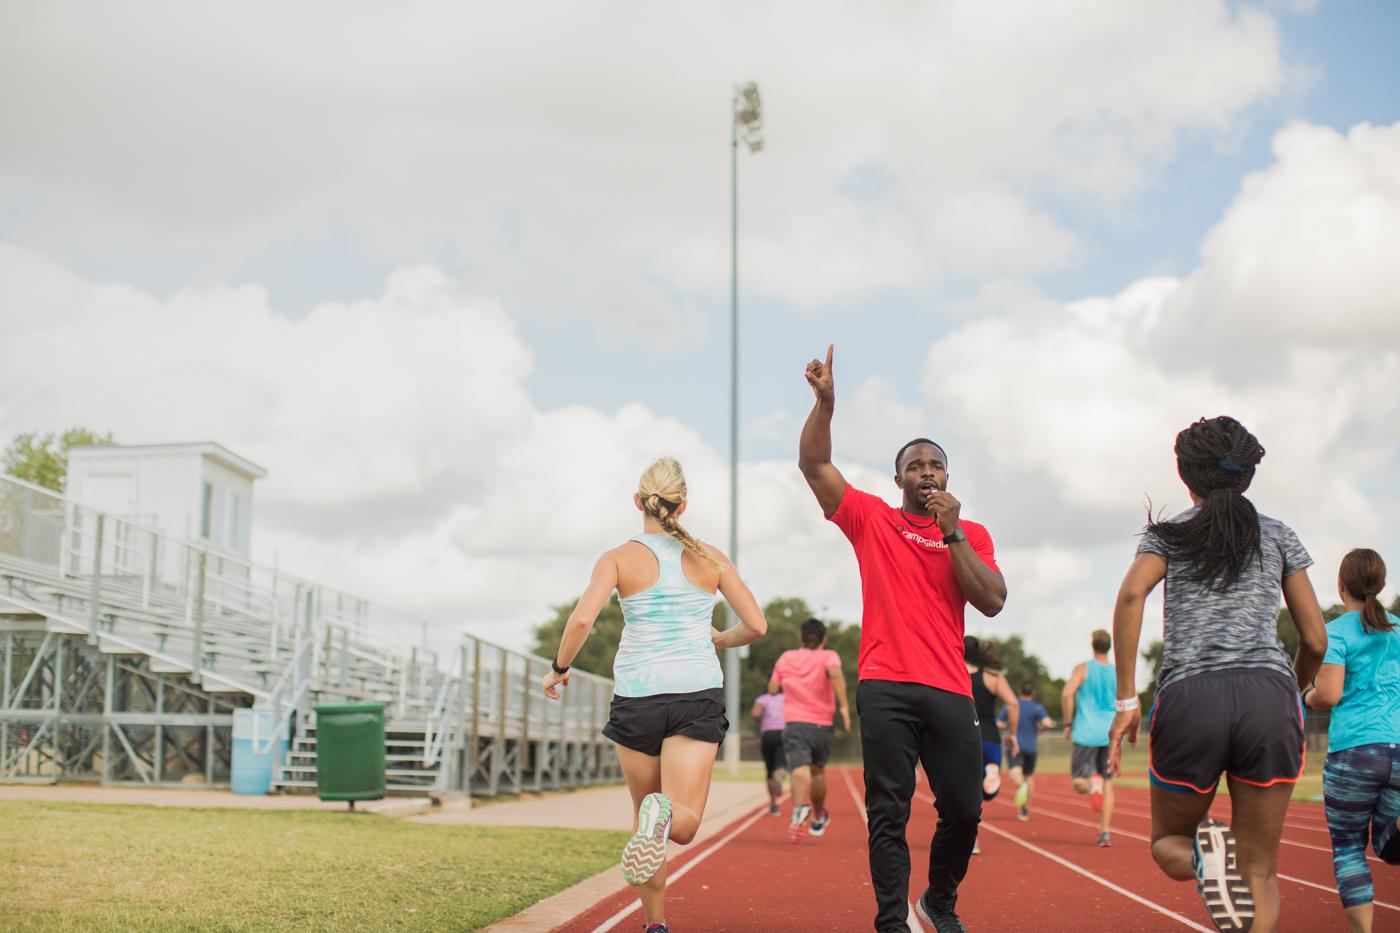 Outdoor lifestyle photography fitness training photoshoot.